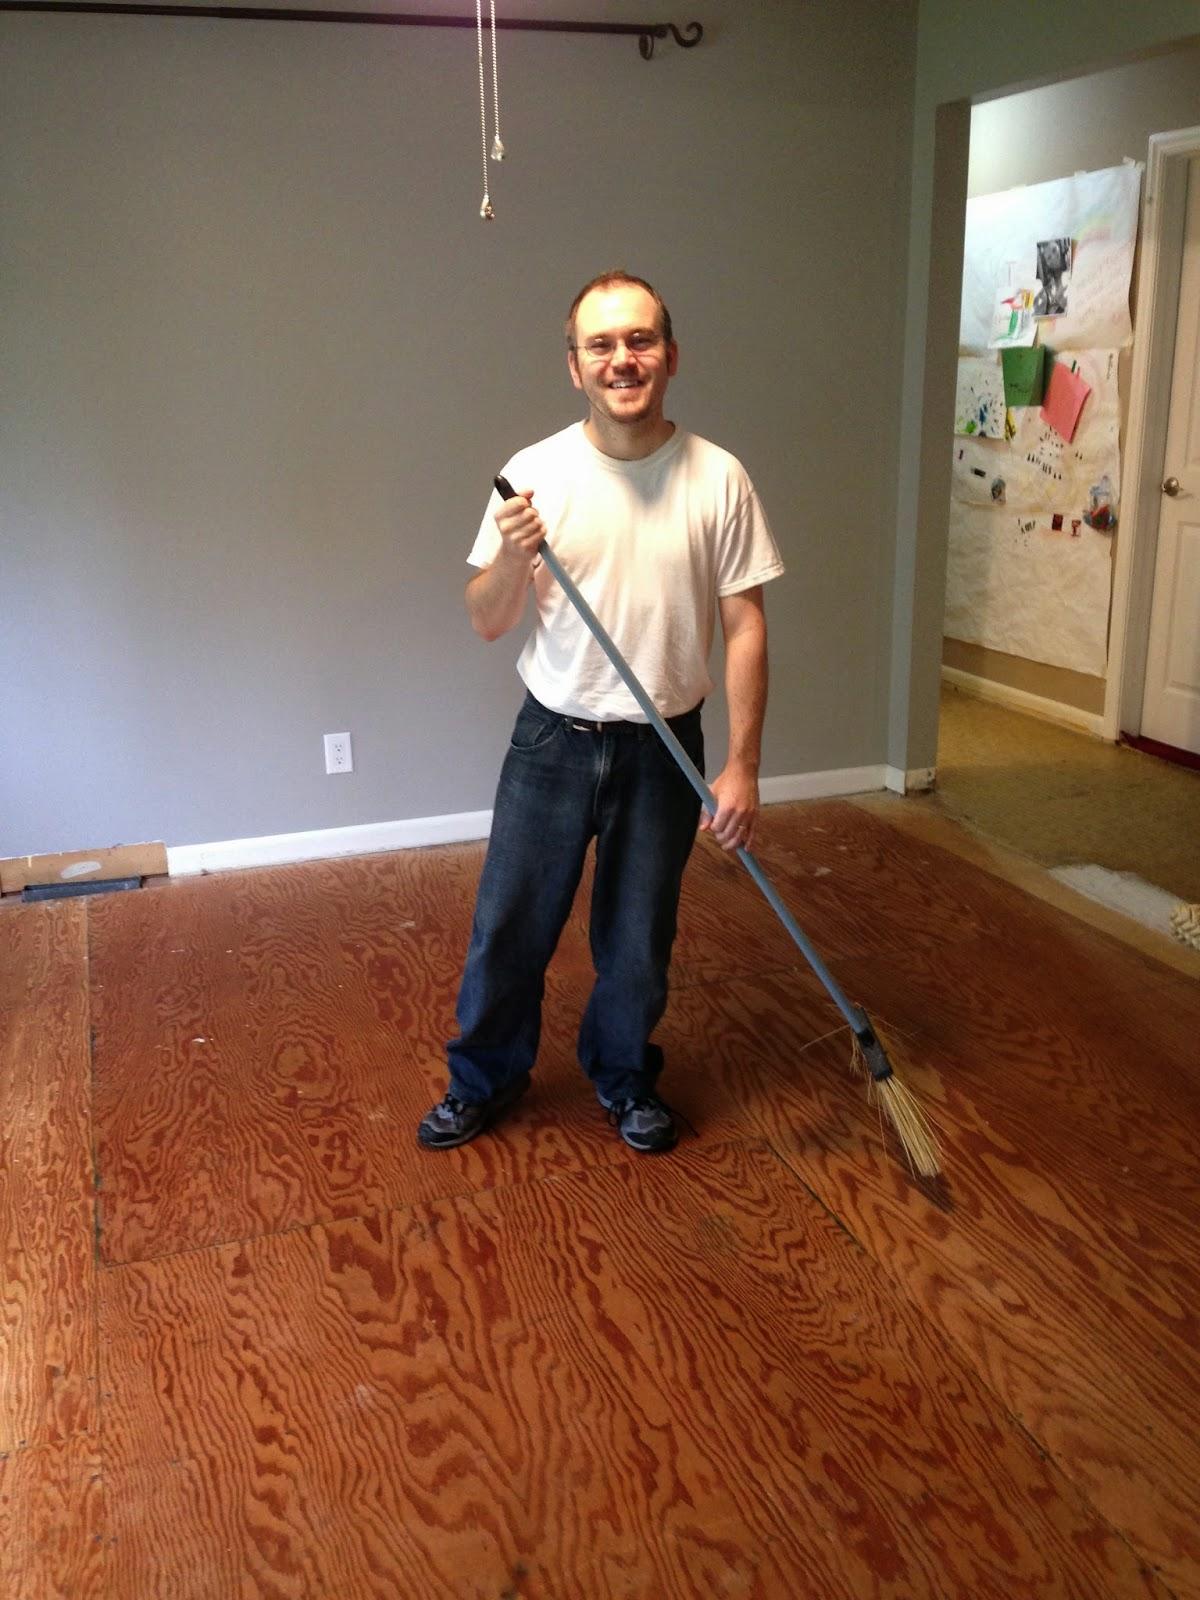 Josh Day with broom